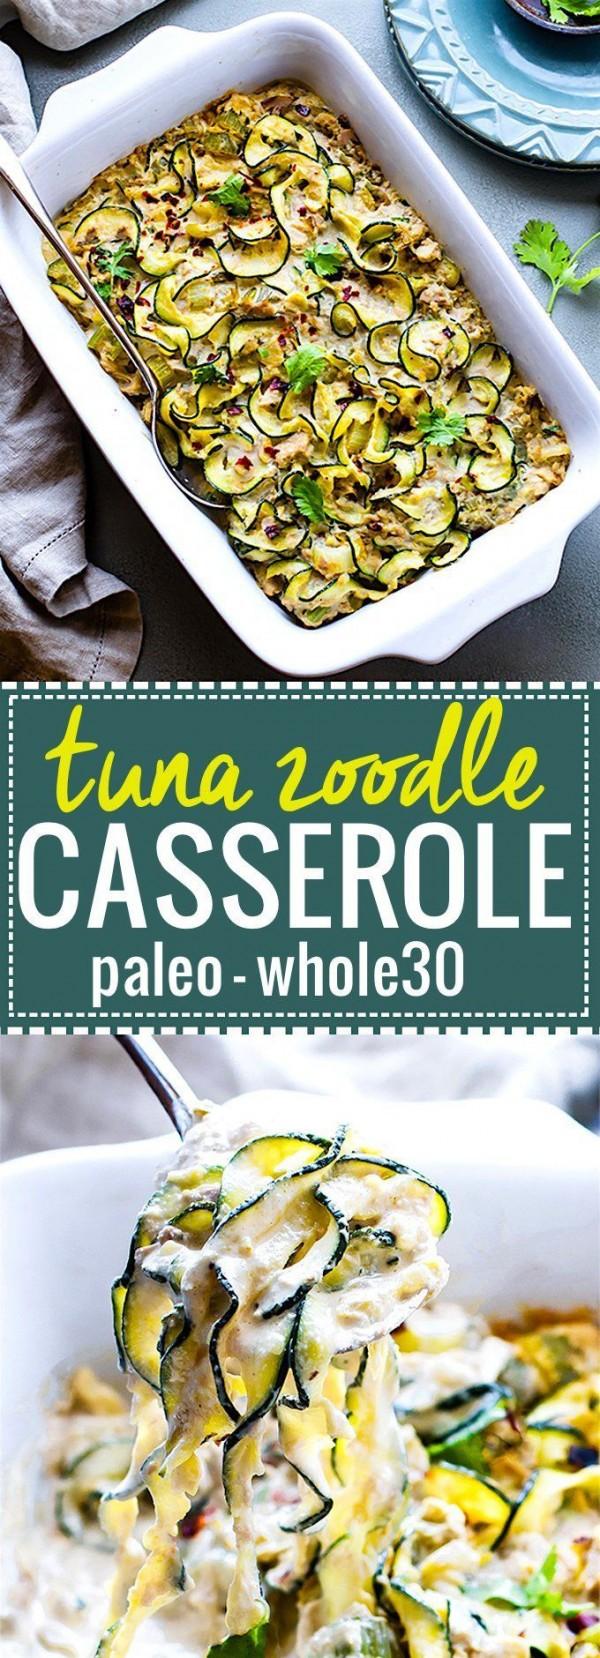 Get the recipe Paleo Tuna Green Chile Zoodle Casserole @recipes_to_go